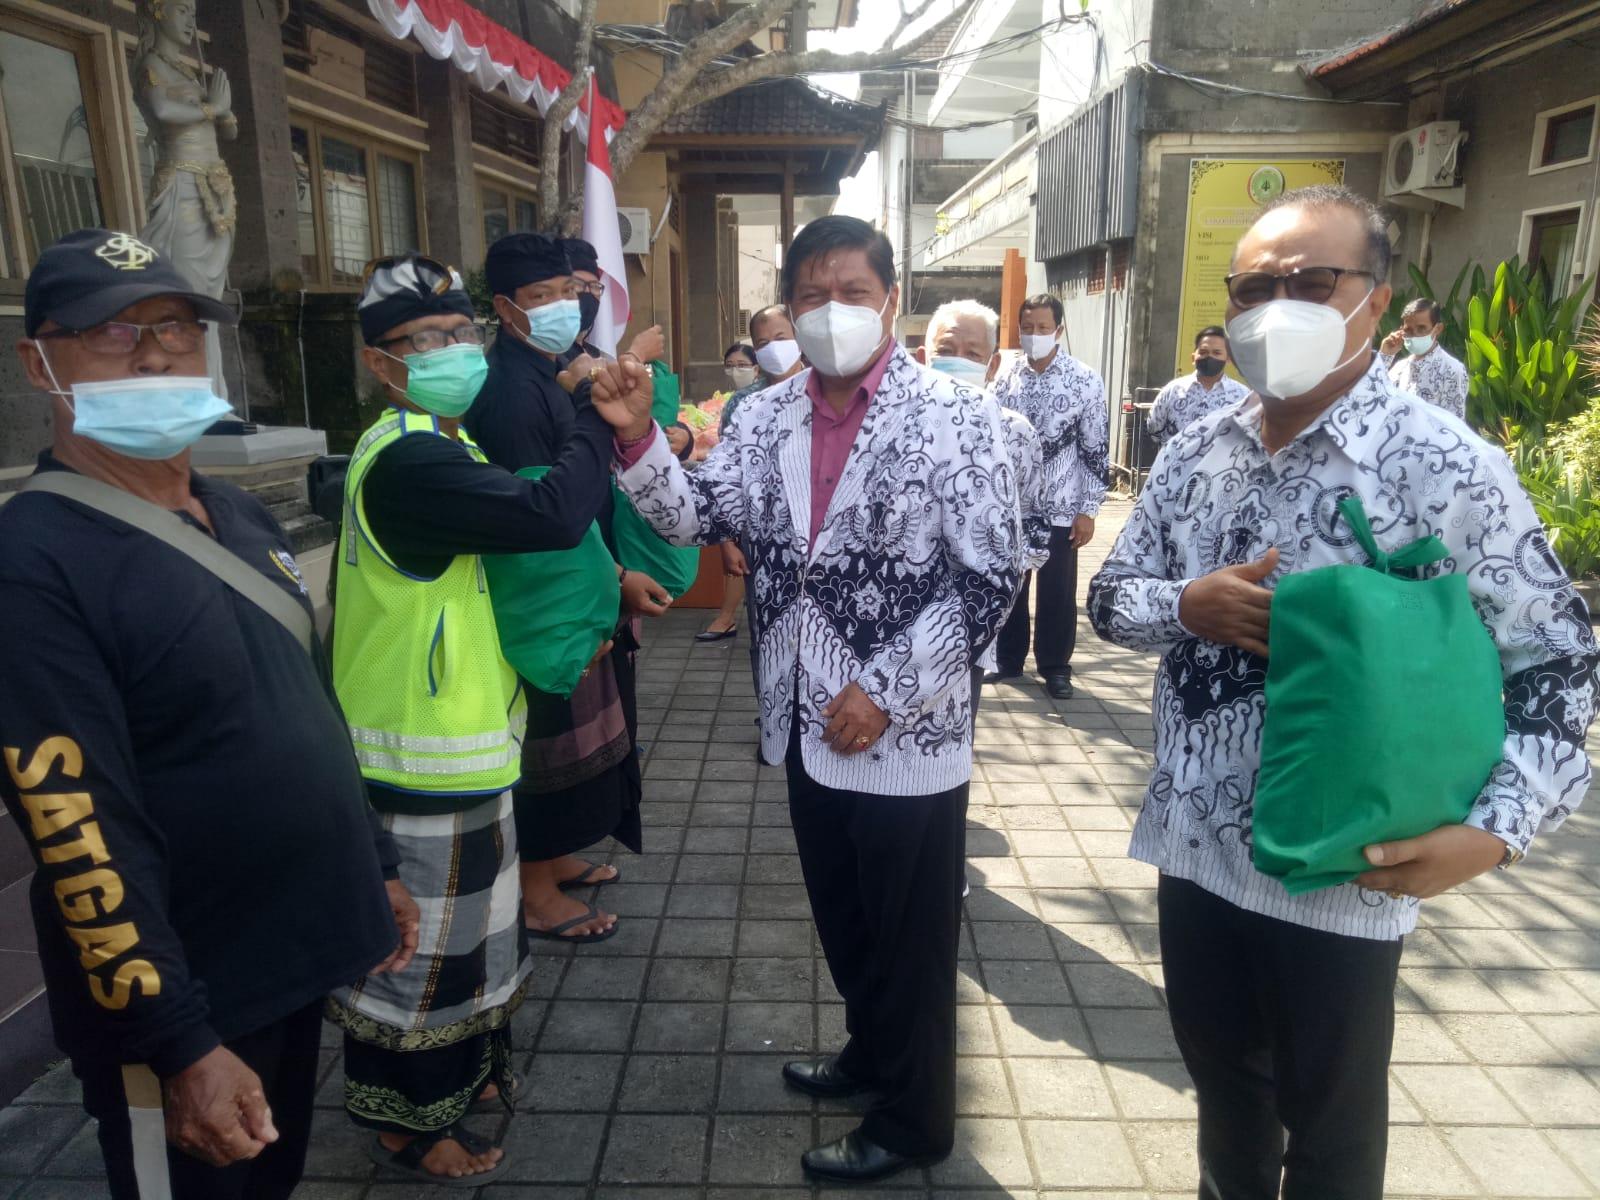 KETUA PGRI Kota Denpasar, I Ketut Suarya, bersama Rektor Universitas PGRI Mahadewa Indonesia, I Made Suarta, menyerahkan sembako kepada Satgas Covid-19 Kelurahan Tonja, Senin (9/8/2021). Foto: tra